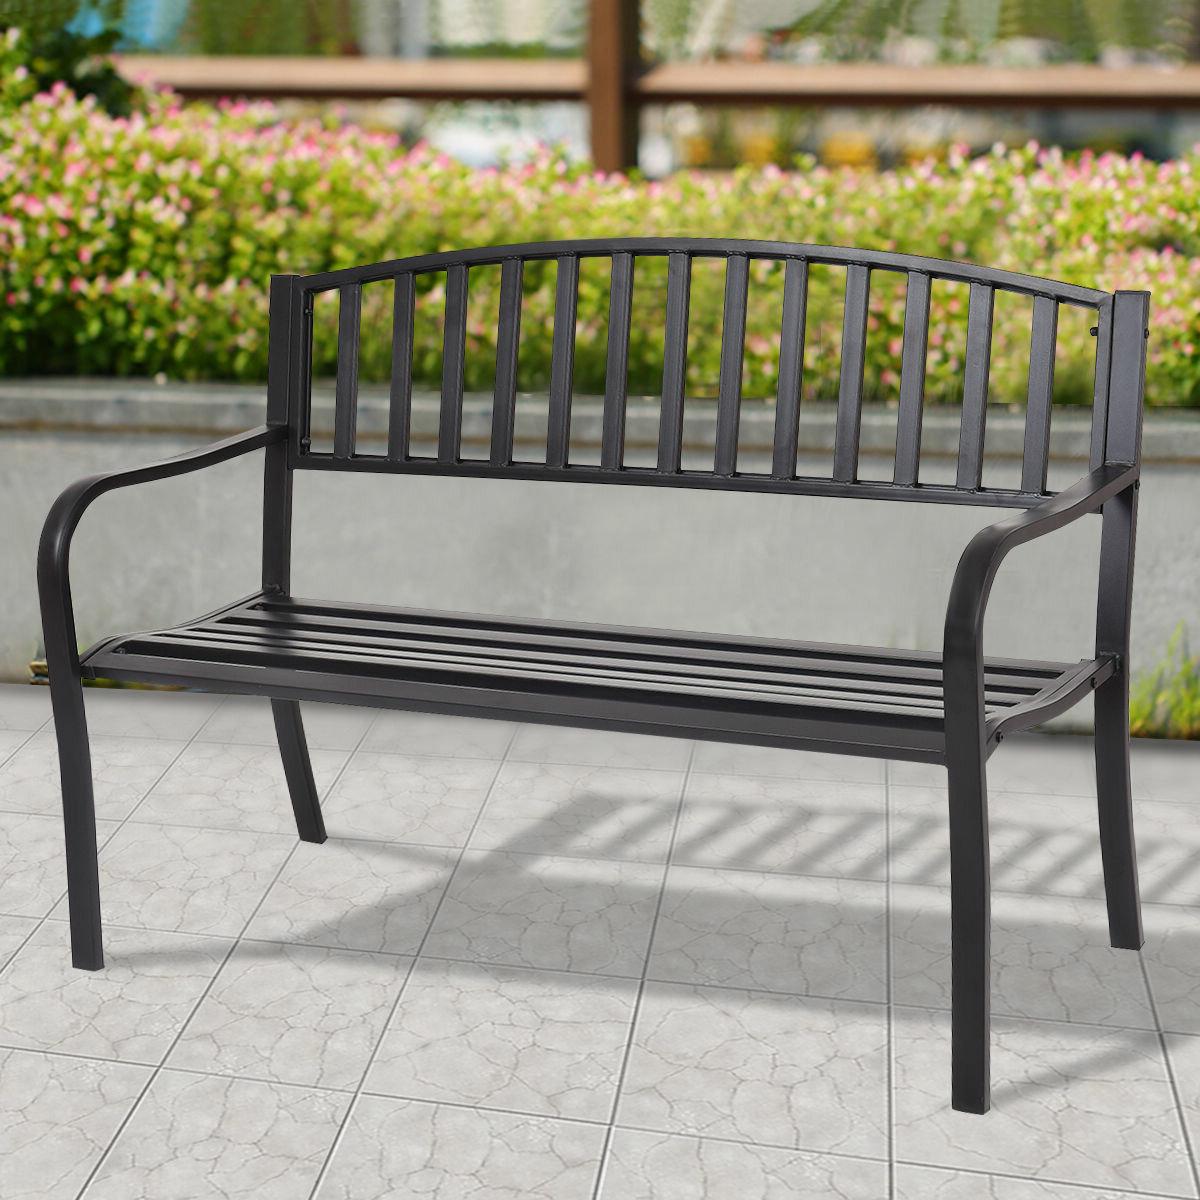 Morin Patio Garden Bench Regarding Recent Heslin Steel Park Benches (View 6 of 30)